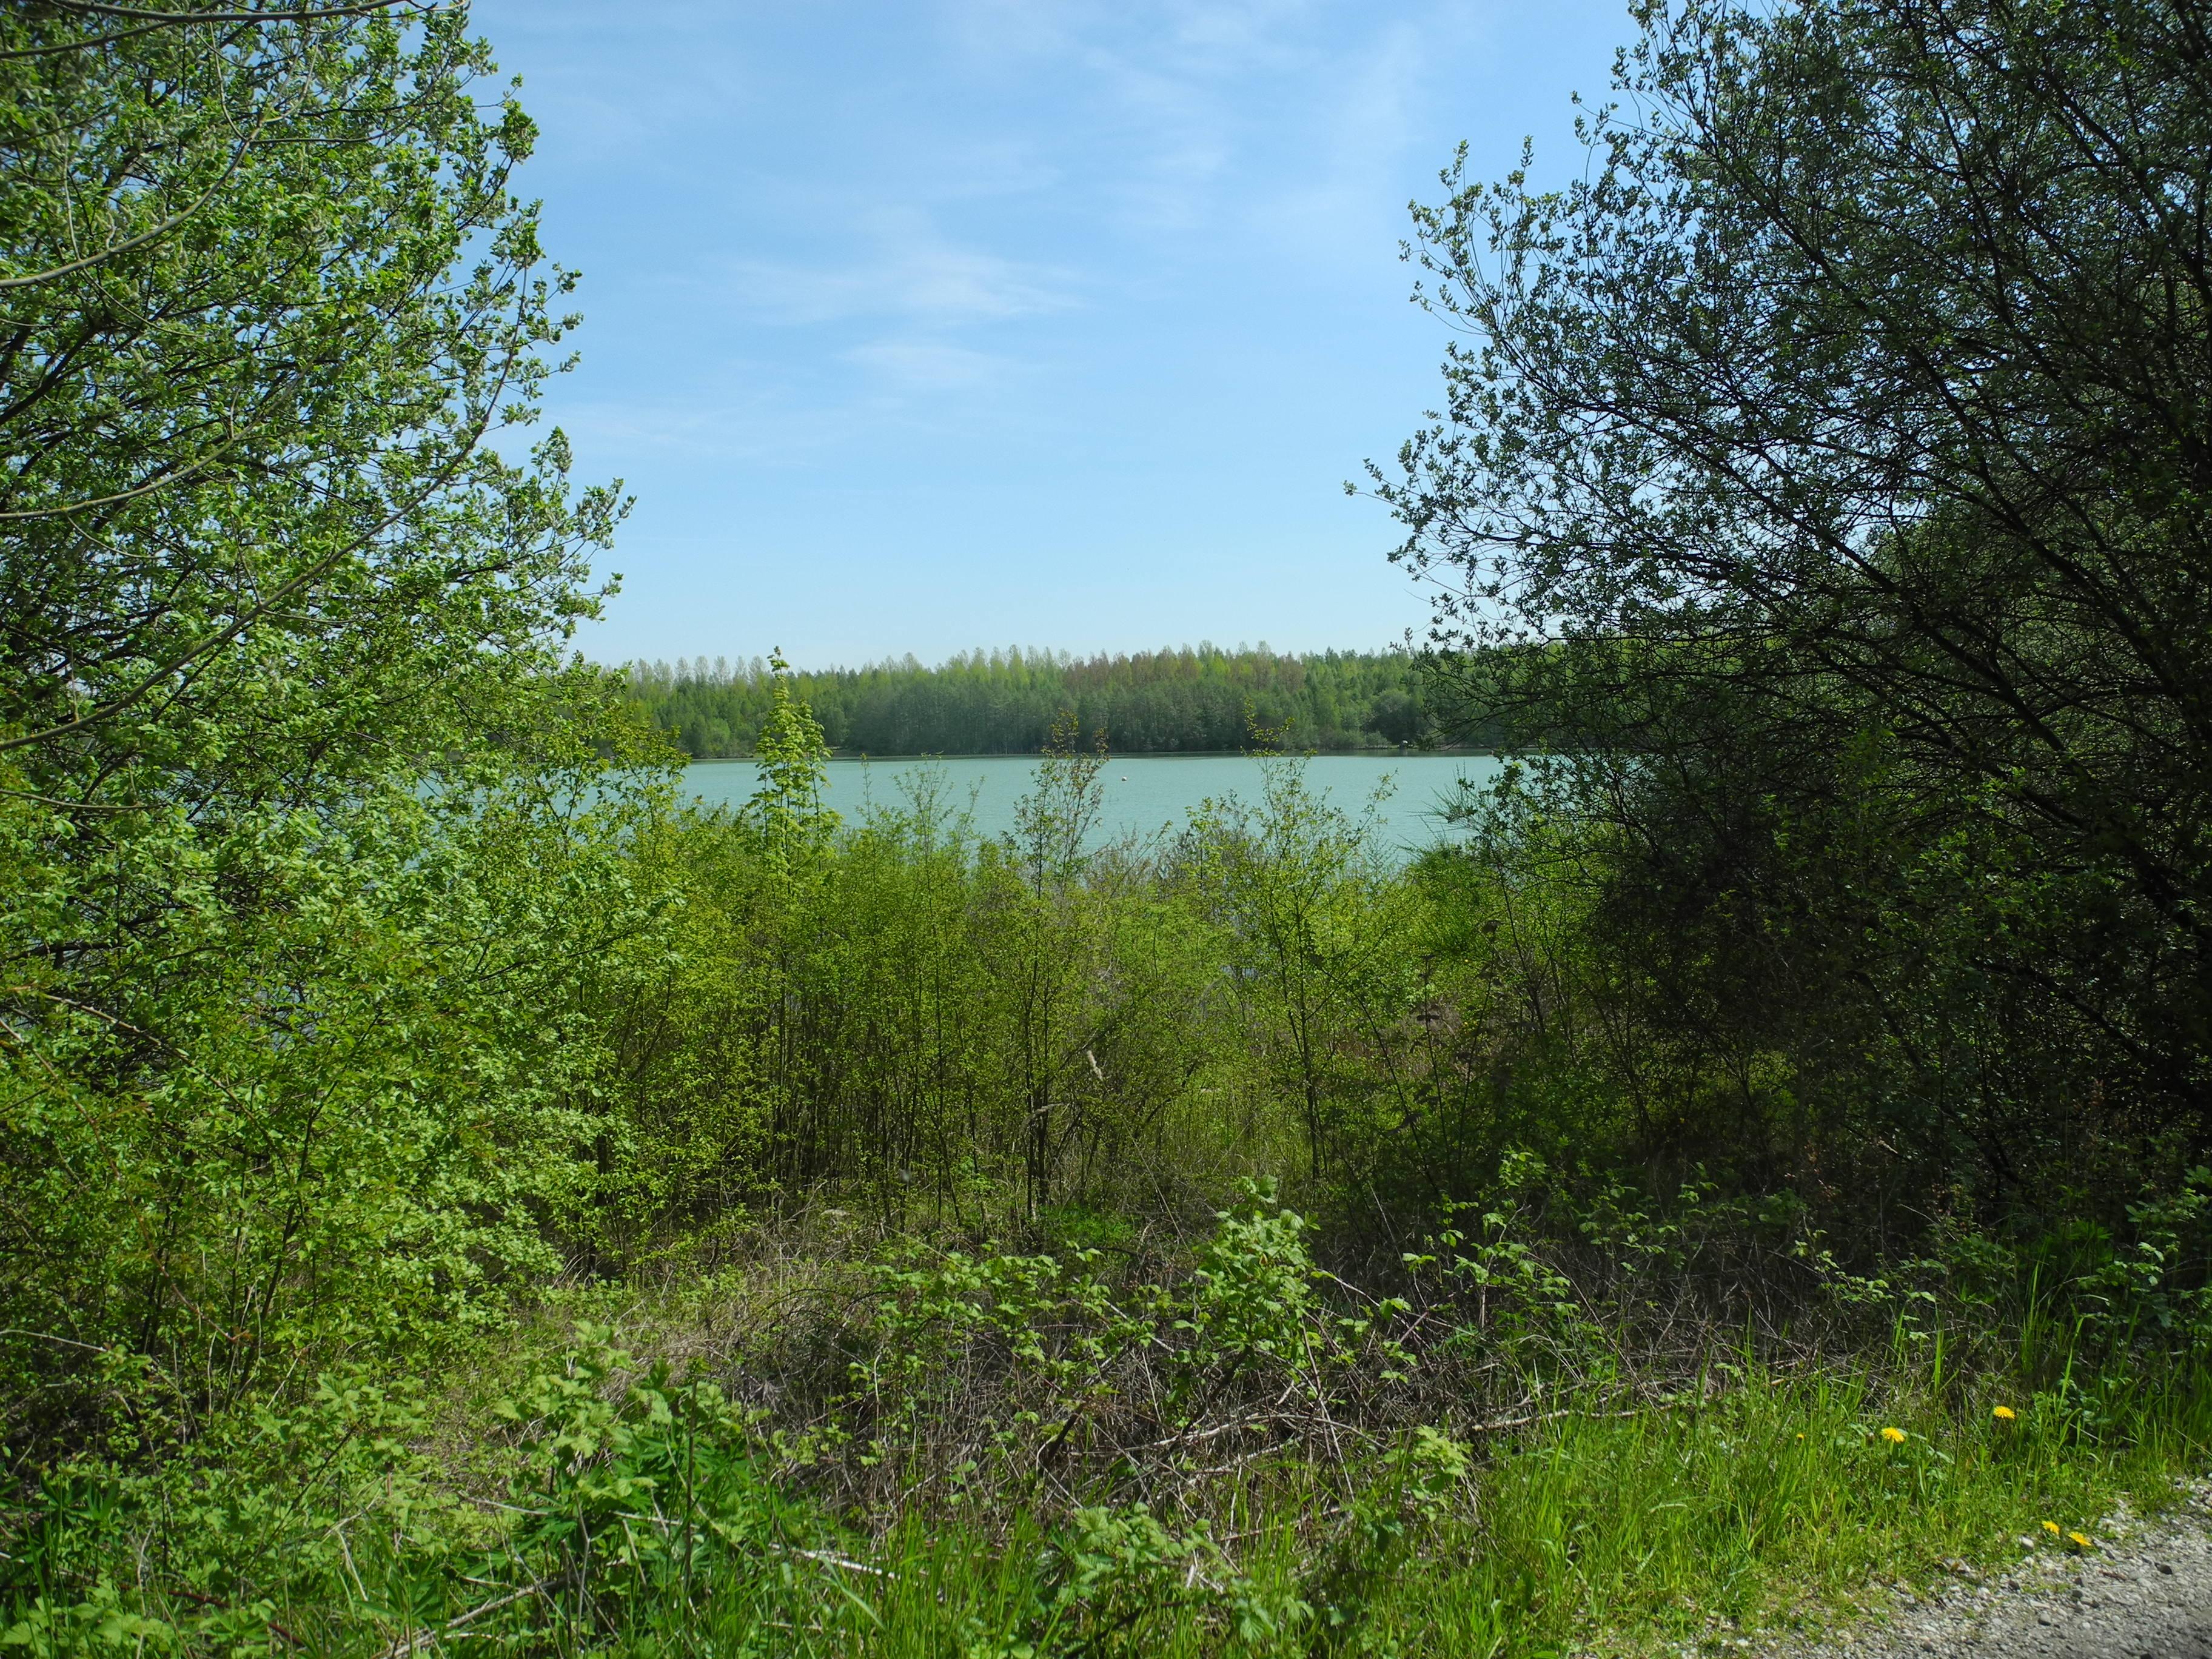 Wald am Blaustein-See